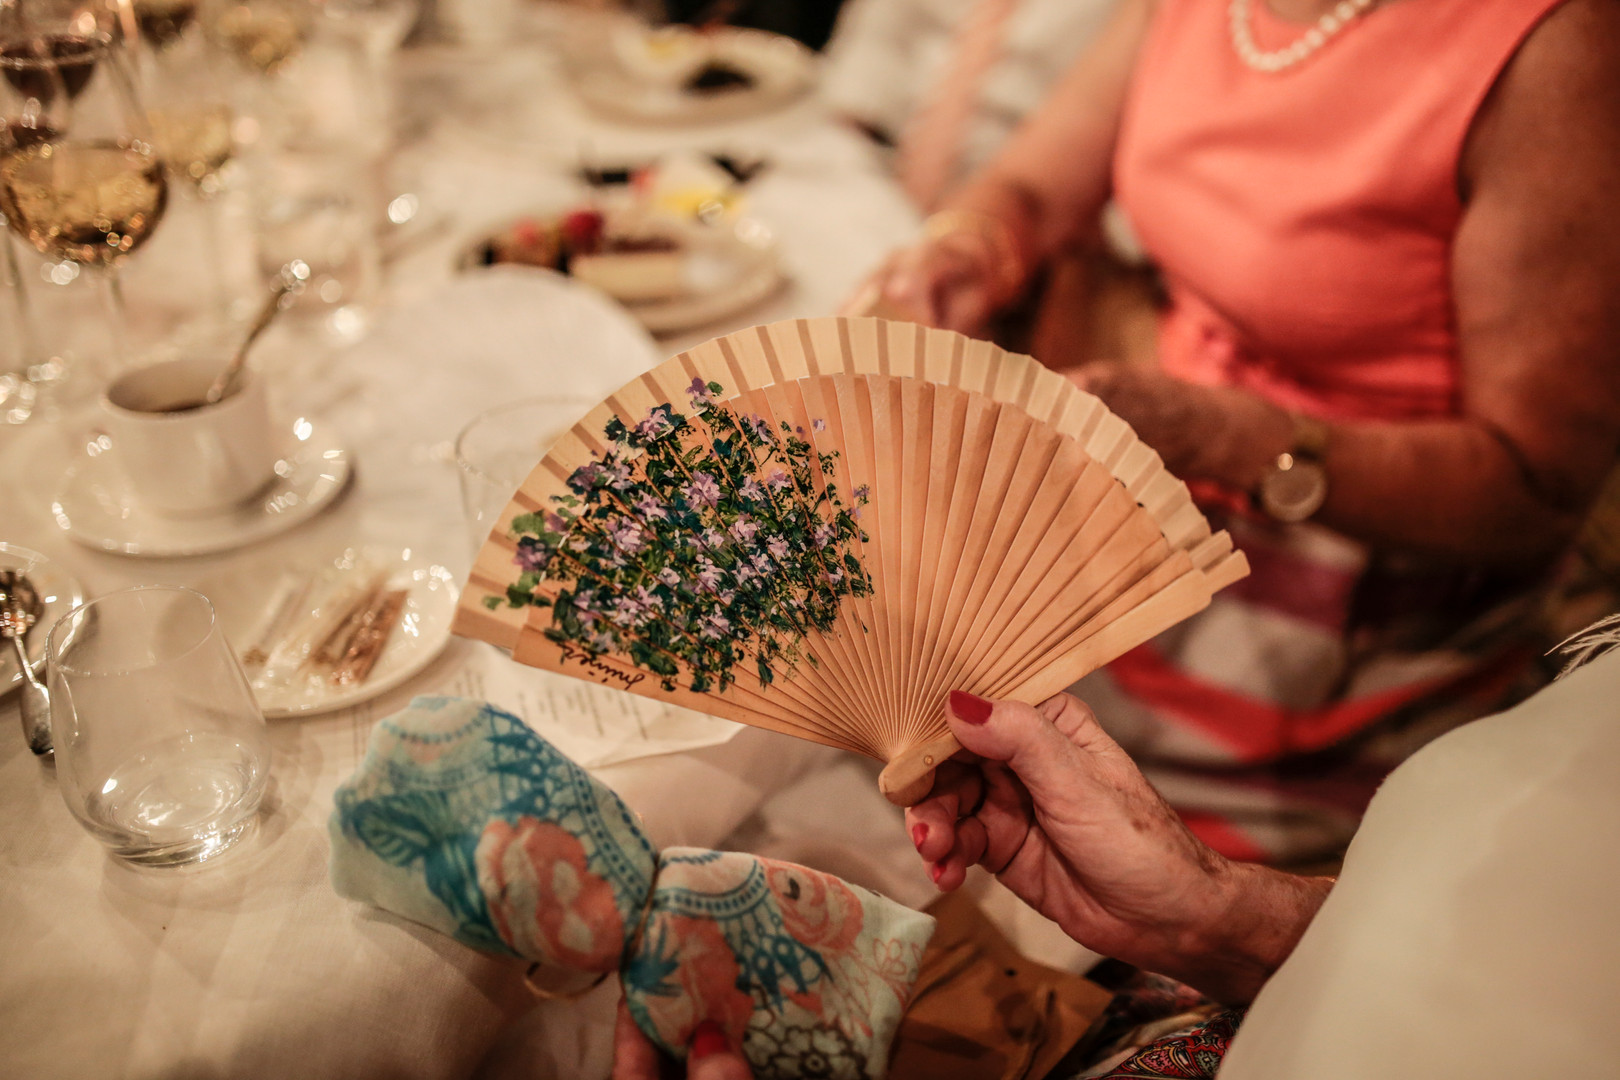 A_S - Banquete-140.jpg